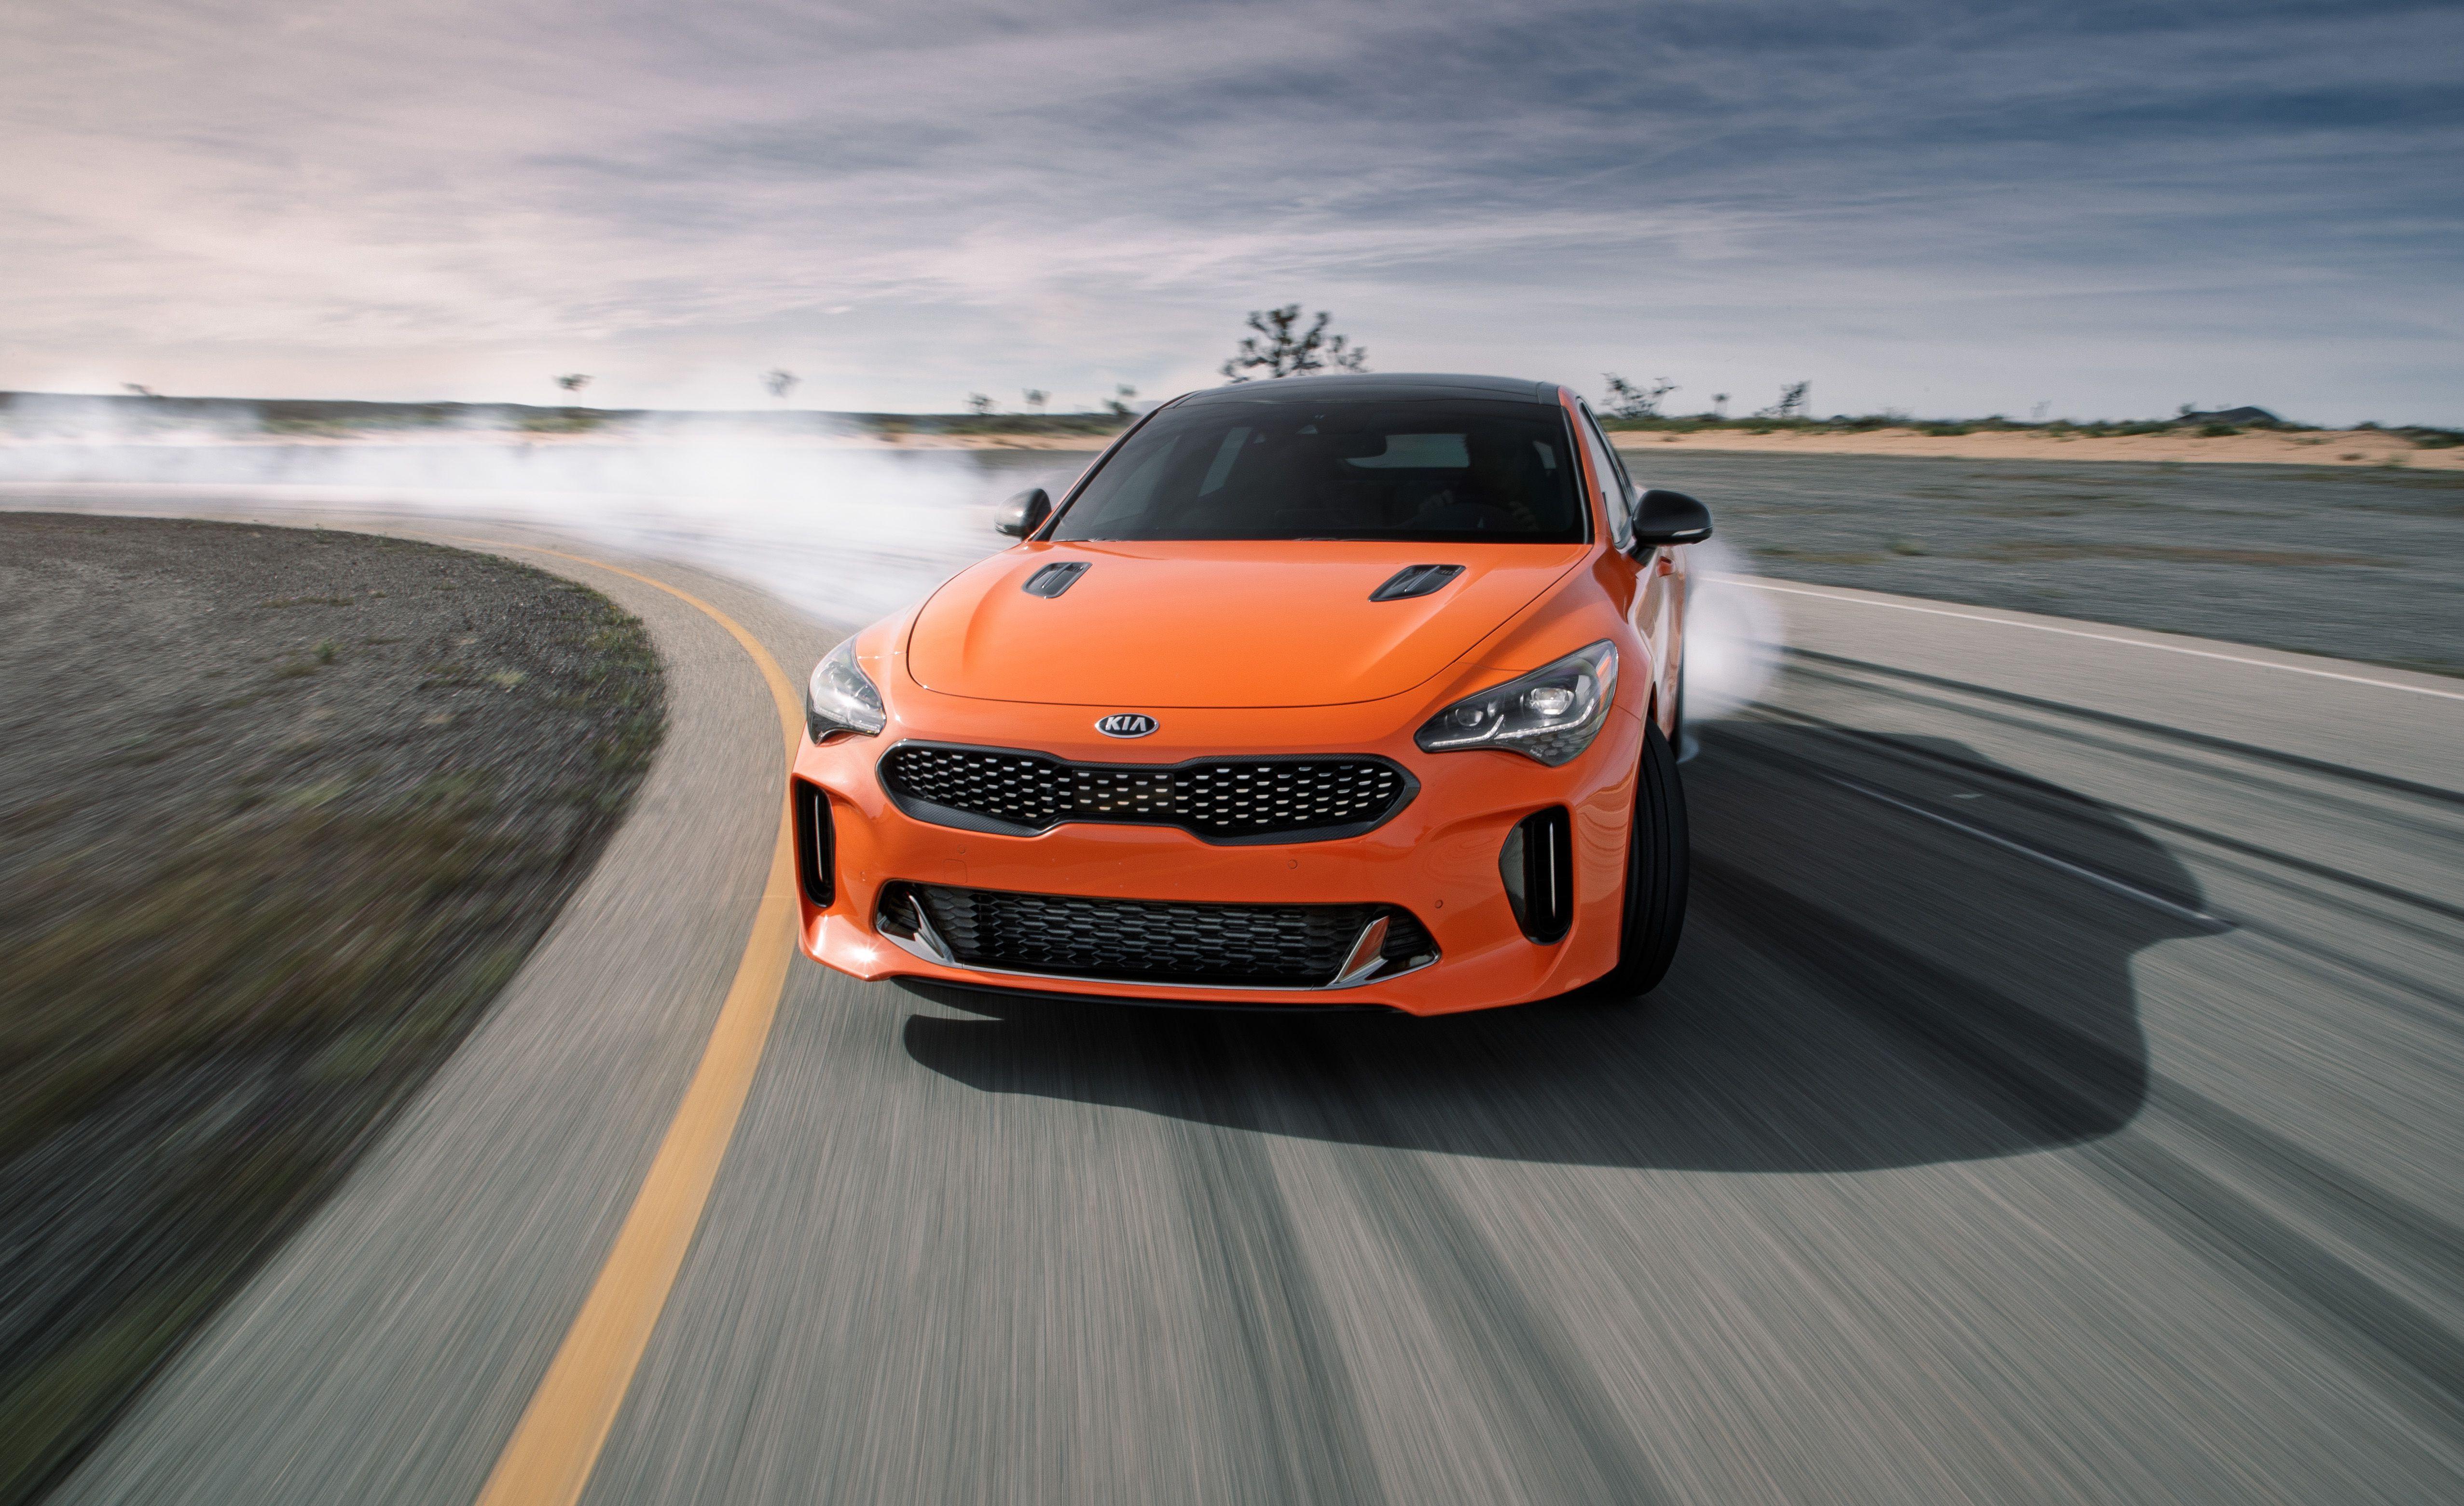 2020 Kia Stinger Gts Is An Orange Special Edition With A Drift Mode Up Its Sleeve Kia Stinger Kia Motors Kia